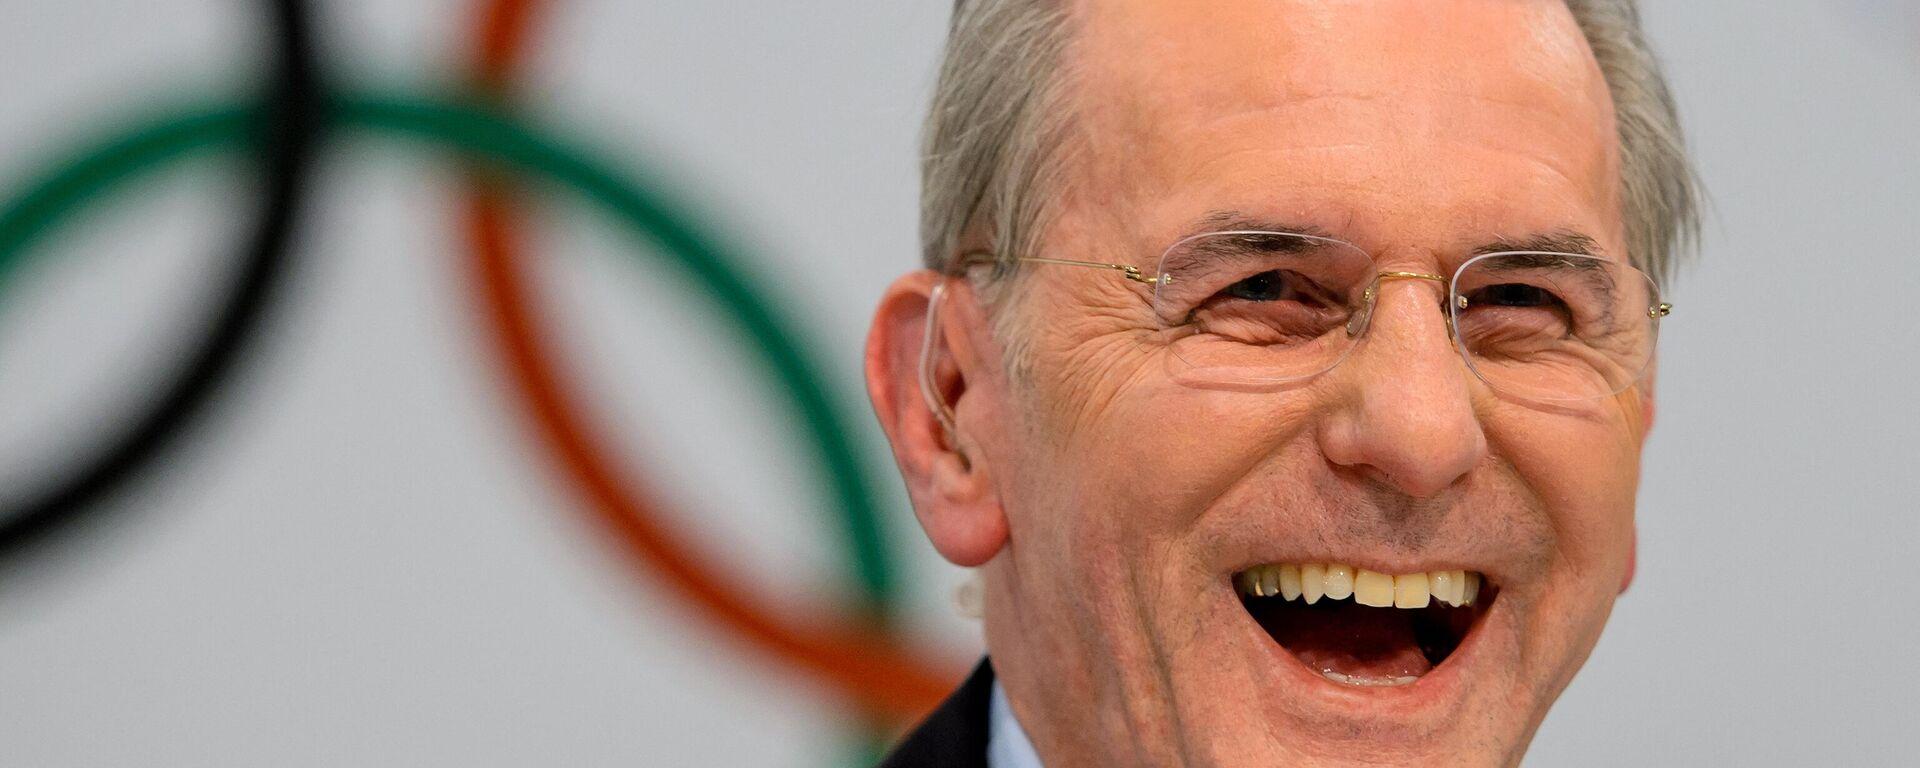 Der frühere IOC-Präsident Jacques Rogge - SNA, 1920, 29.08.2021